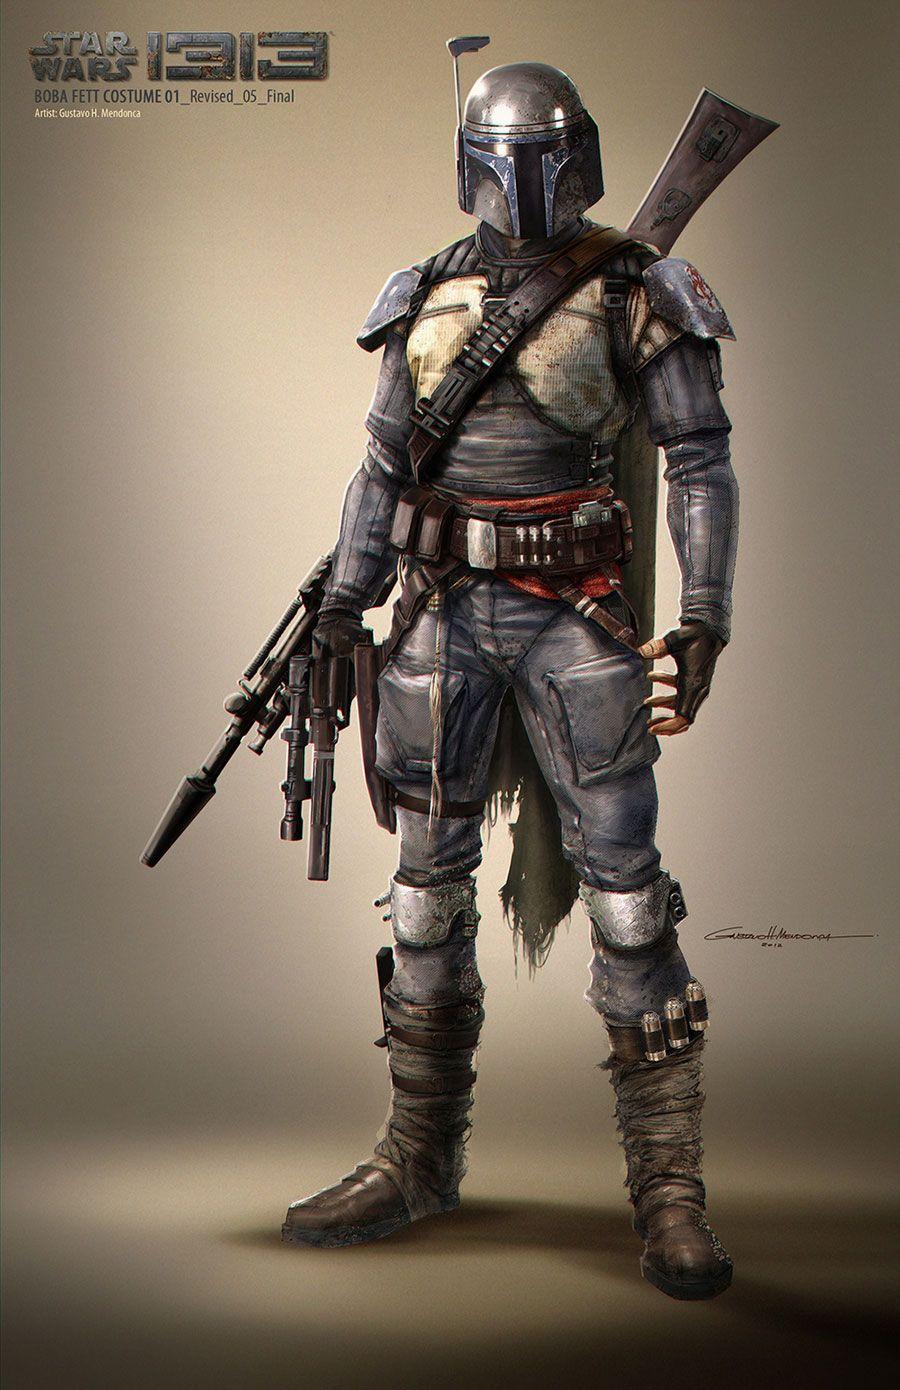 Boba Fett Costume - Characters & Art - Star Wars 1313 | Star wars 1313,  Star wars pictures, Star wars characters